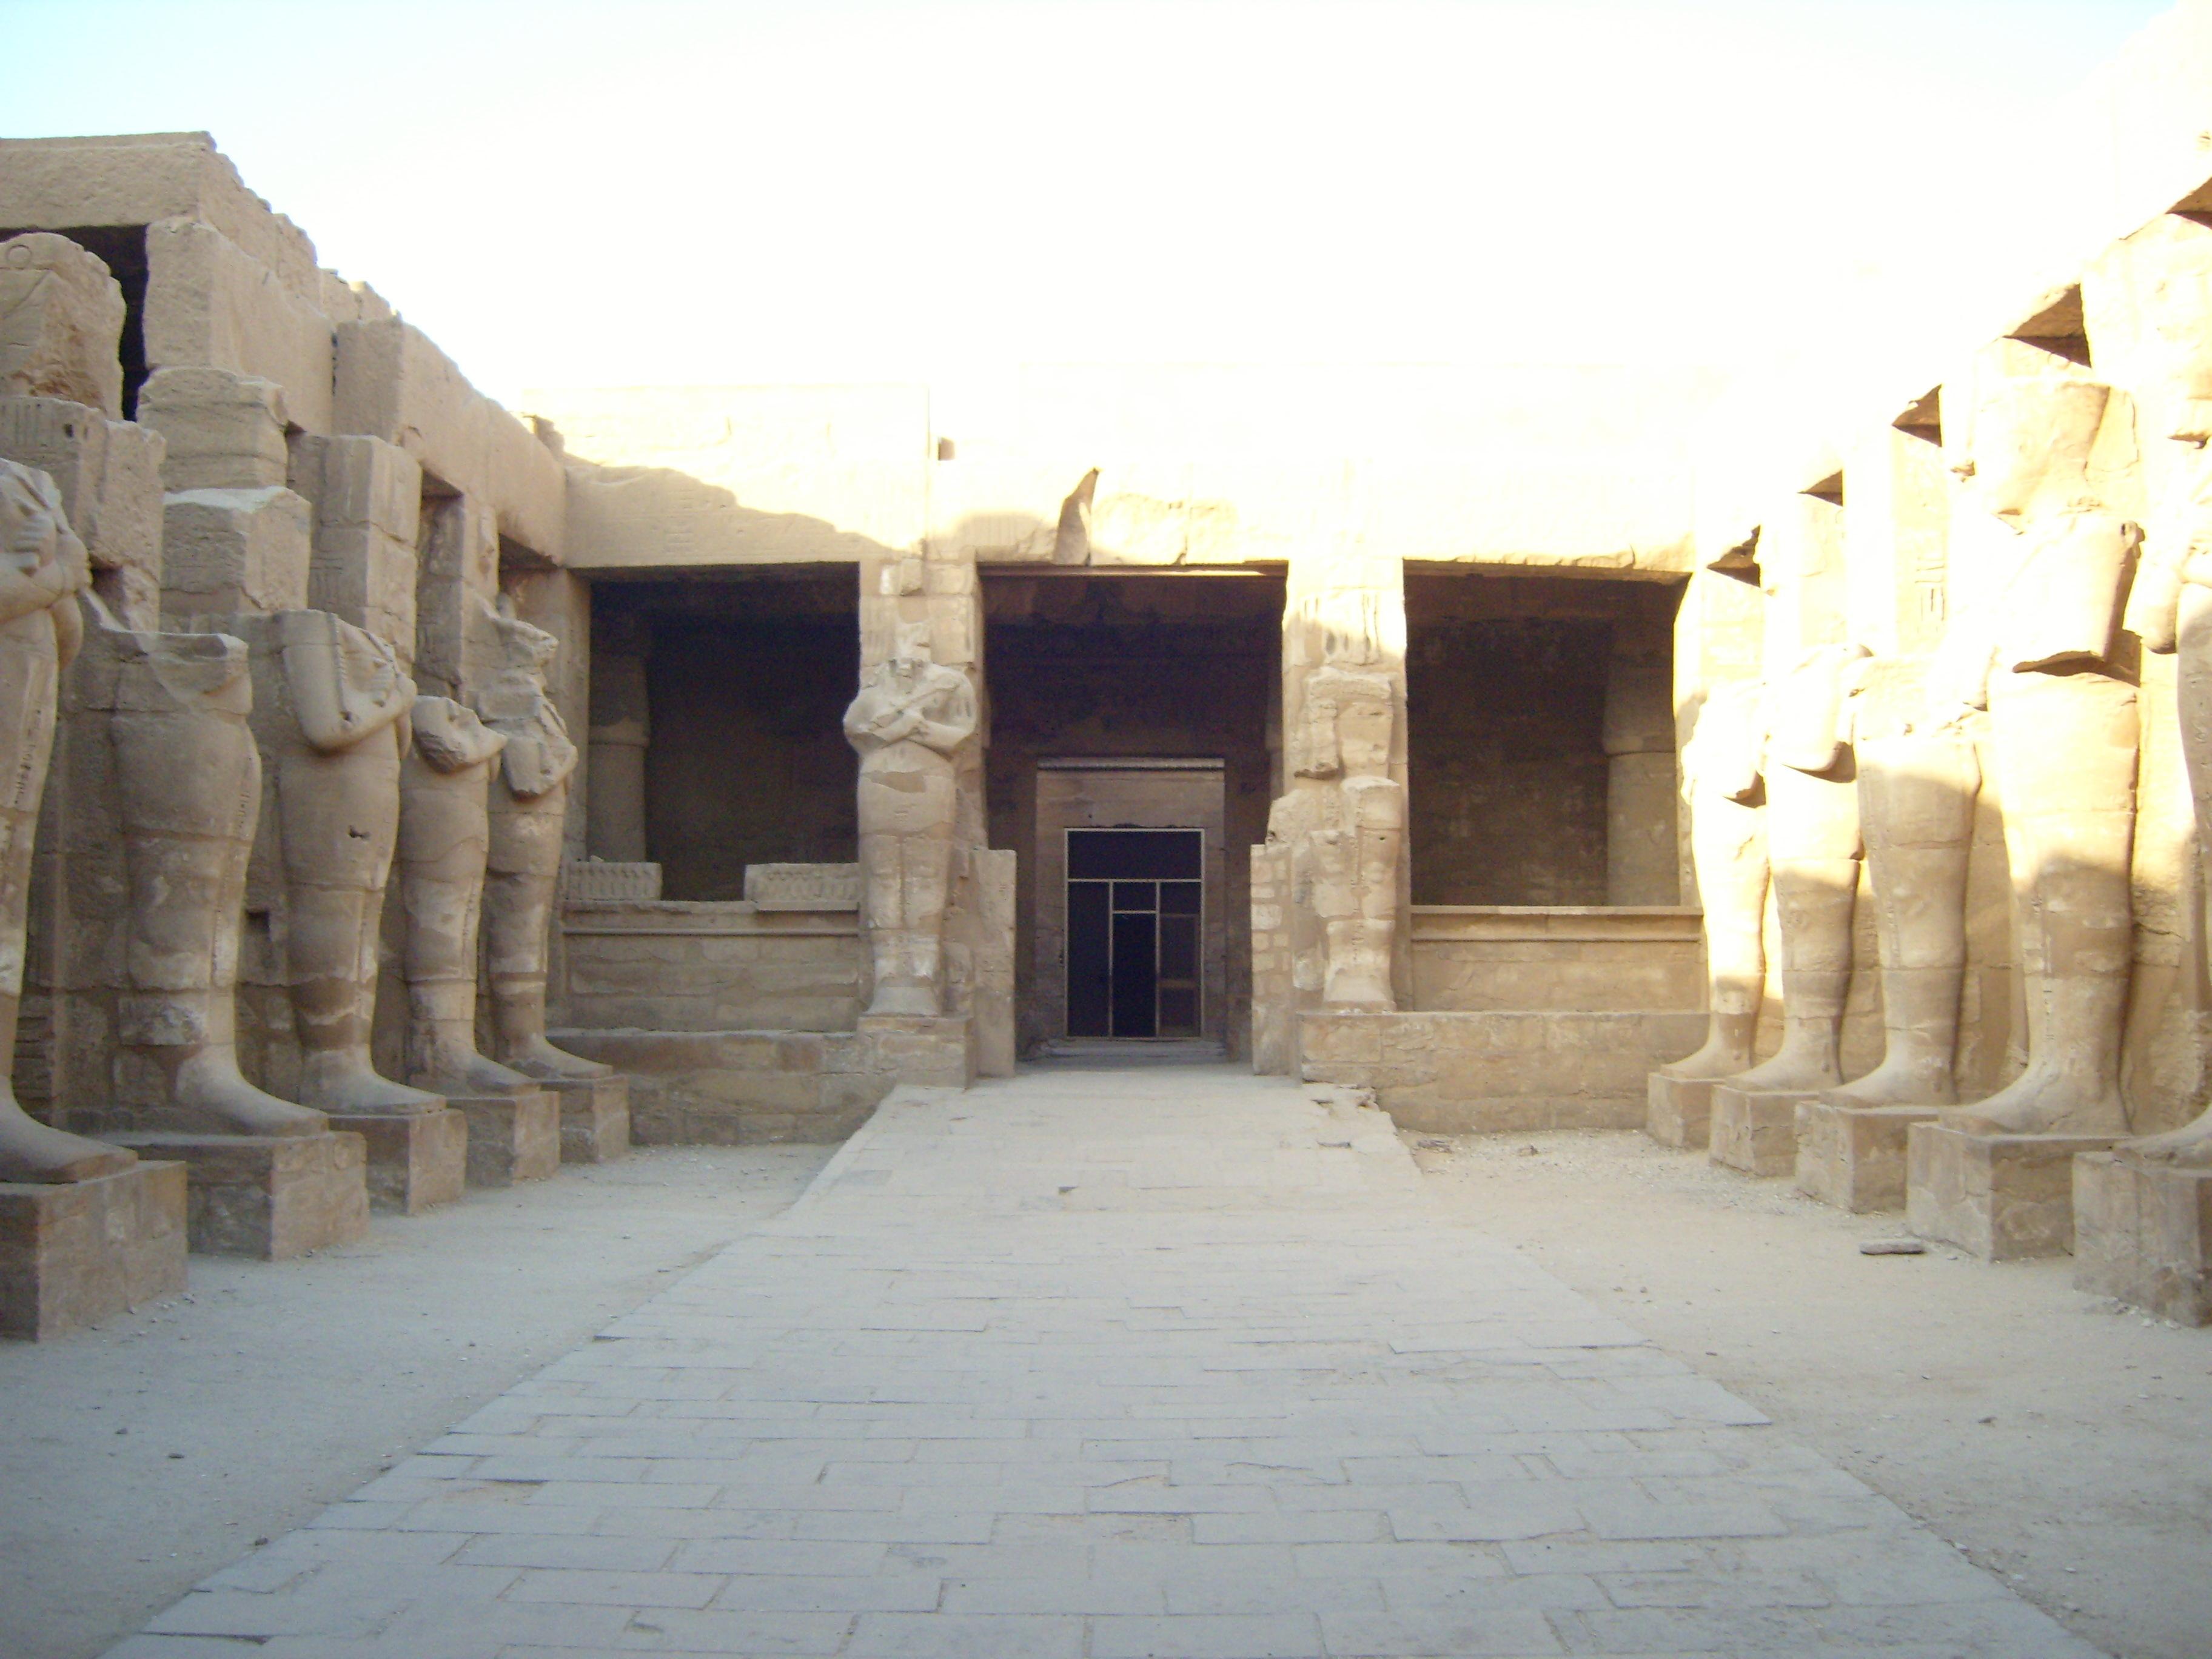 Karnak_Ramses_III_temple_court.jpg